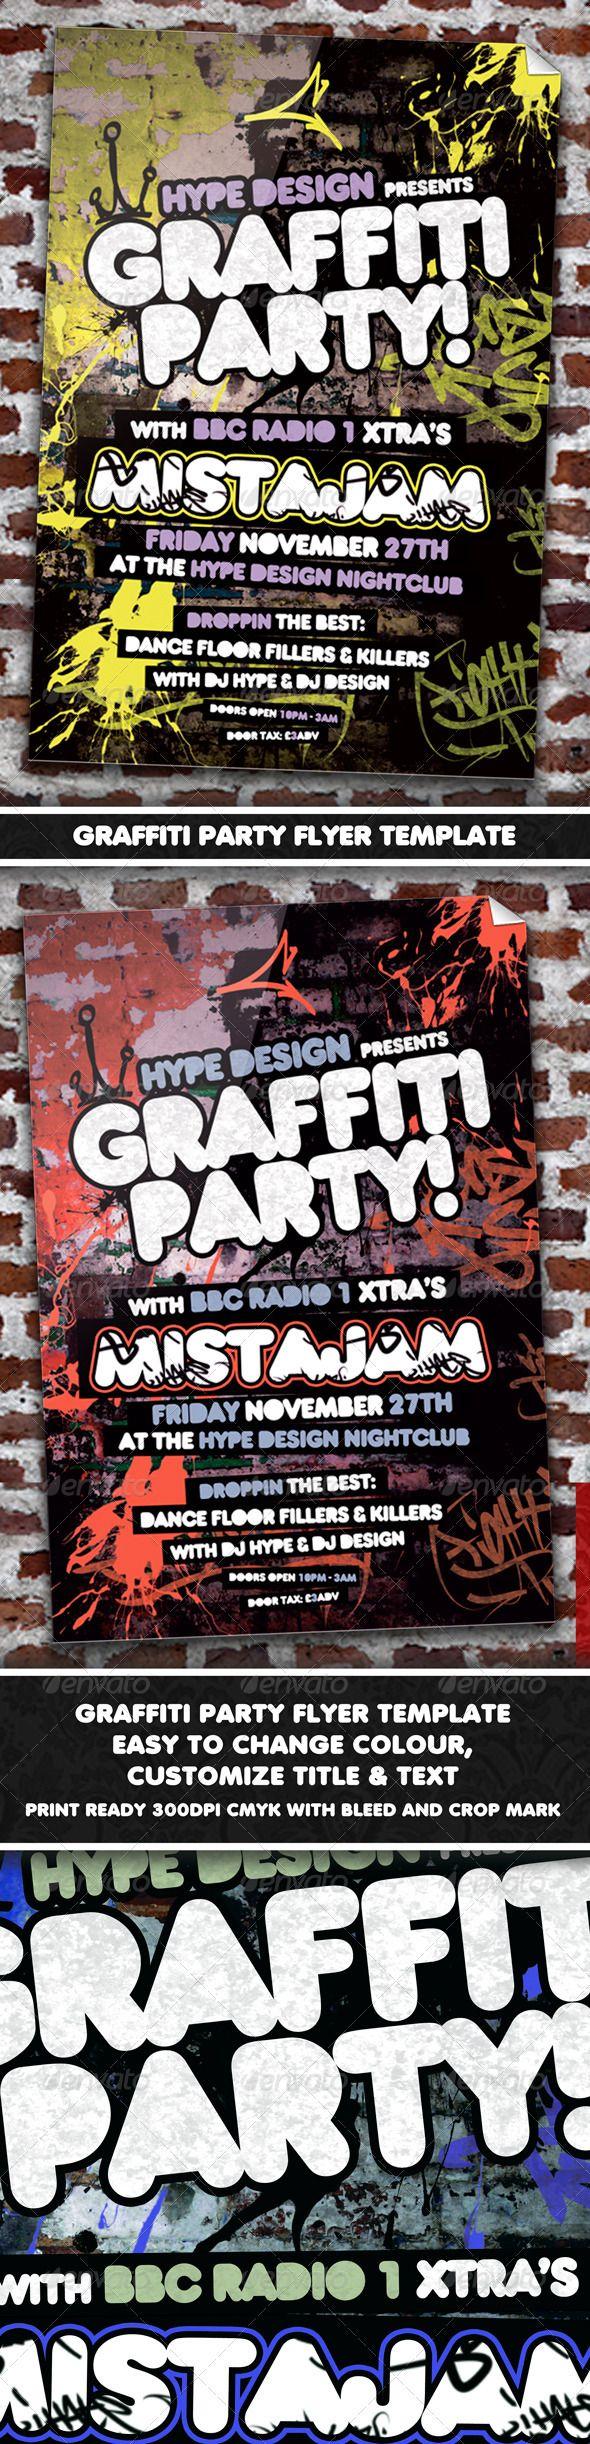 custom party flyers